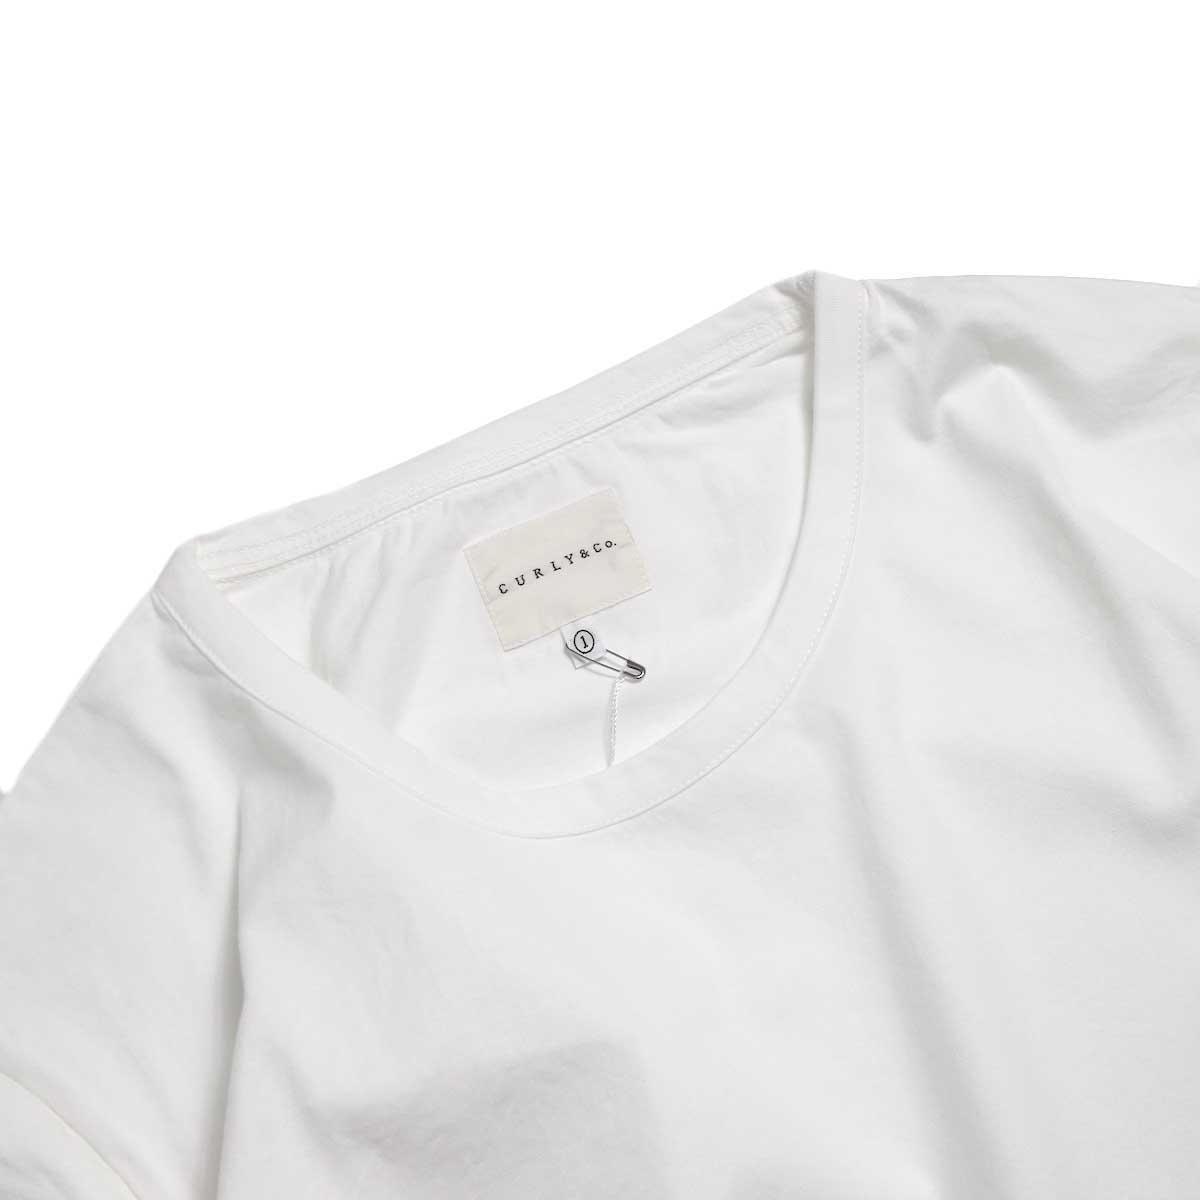 CURLY / SDH HS CN TEE -White クルーネック